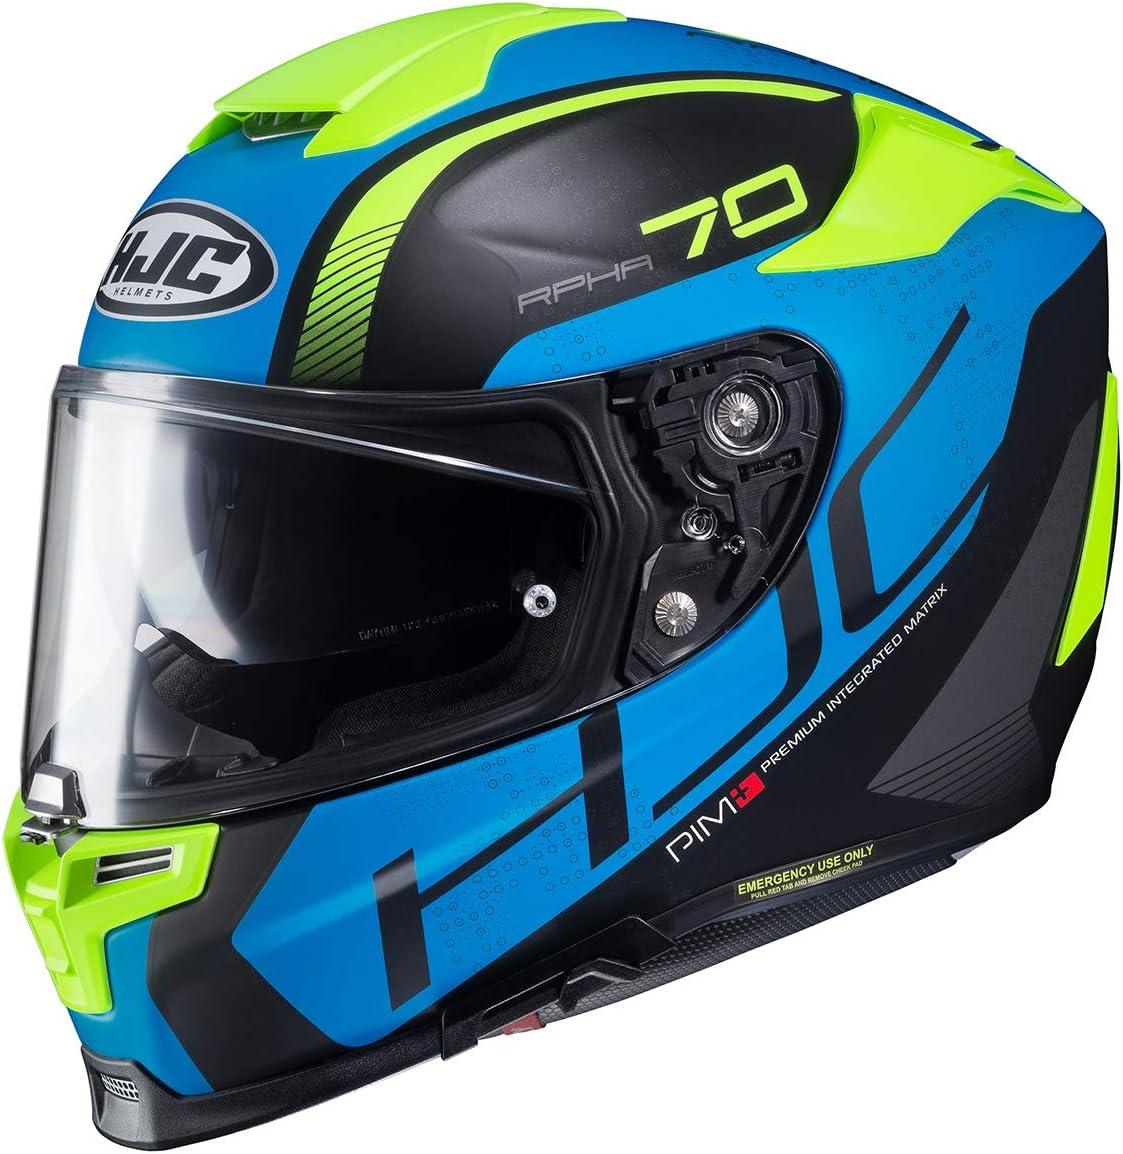 HJC casco rpha70 vias mc1sf xxs